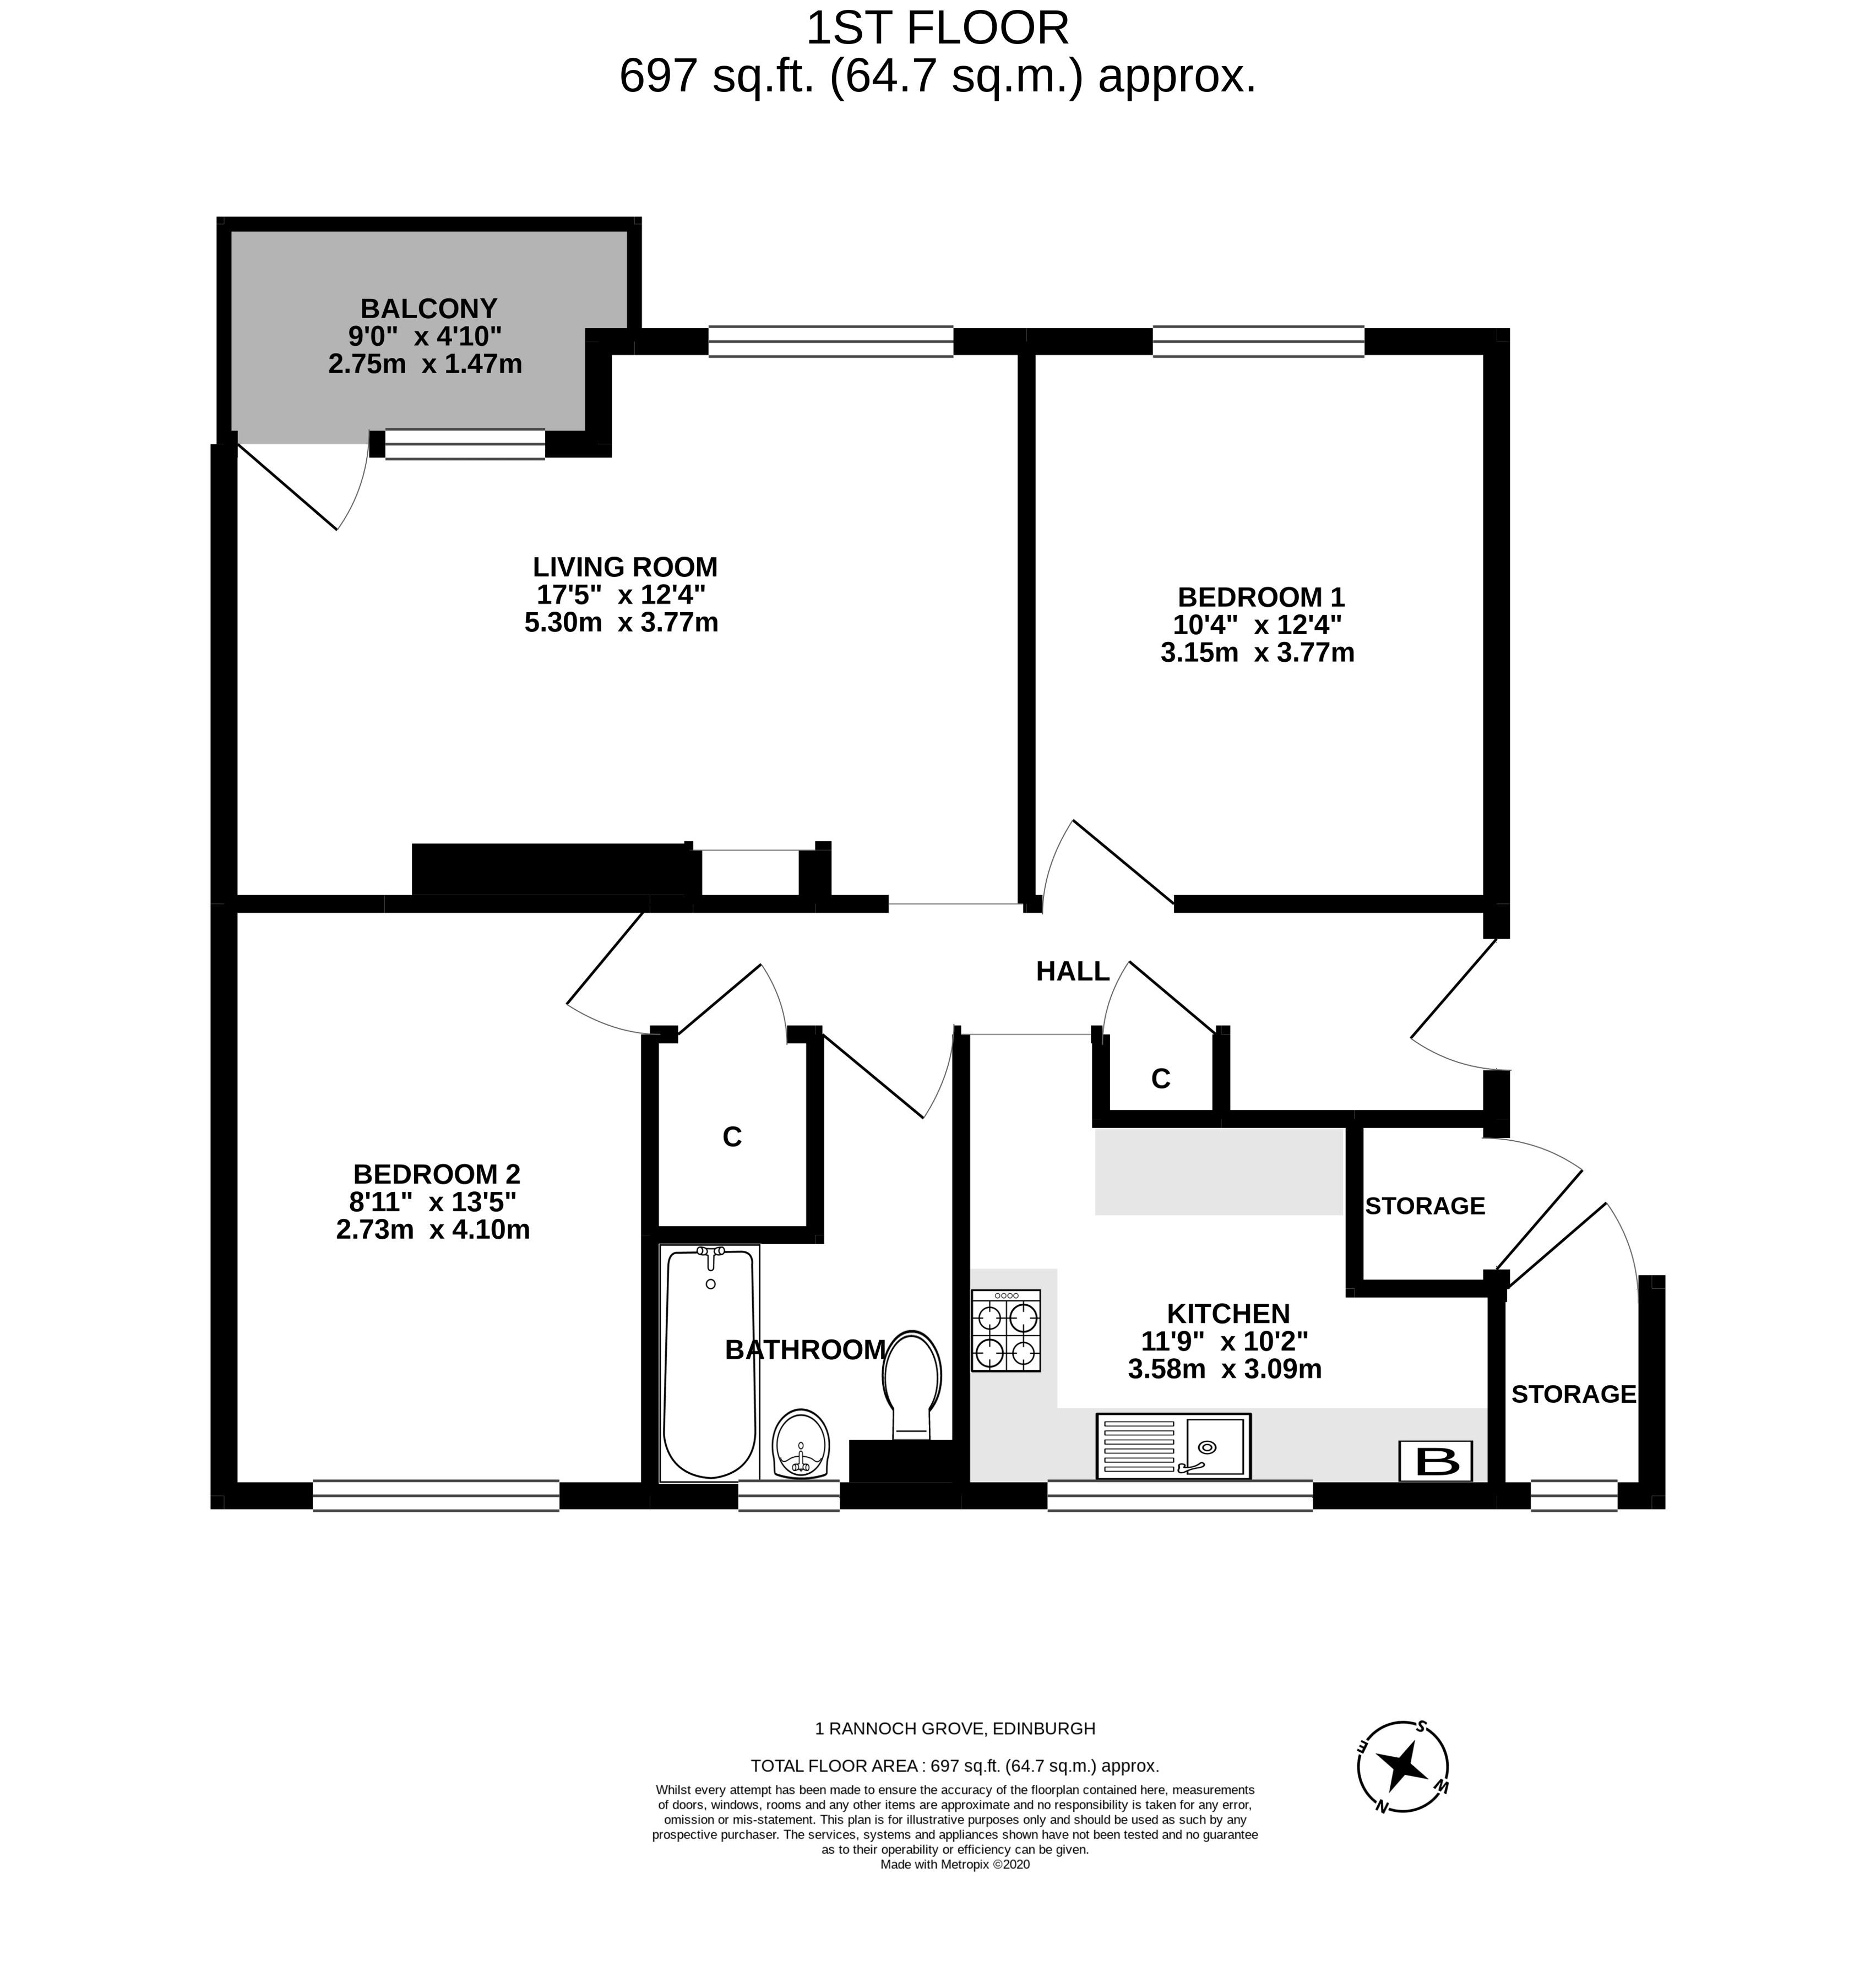 Floorplan 1 of 1/4, Rannoch Grove, Clermiston, Edinburgh, EH4 7EH